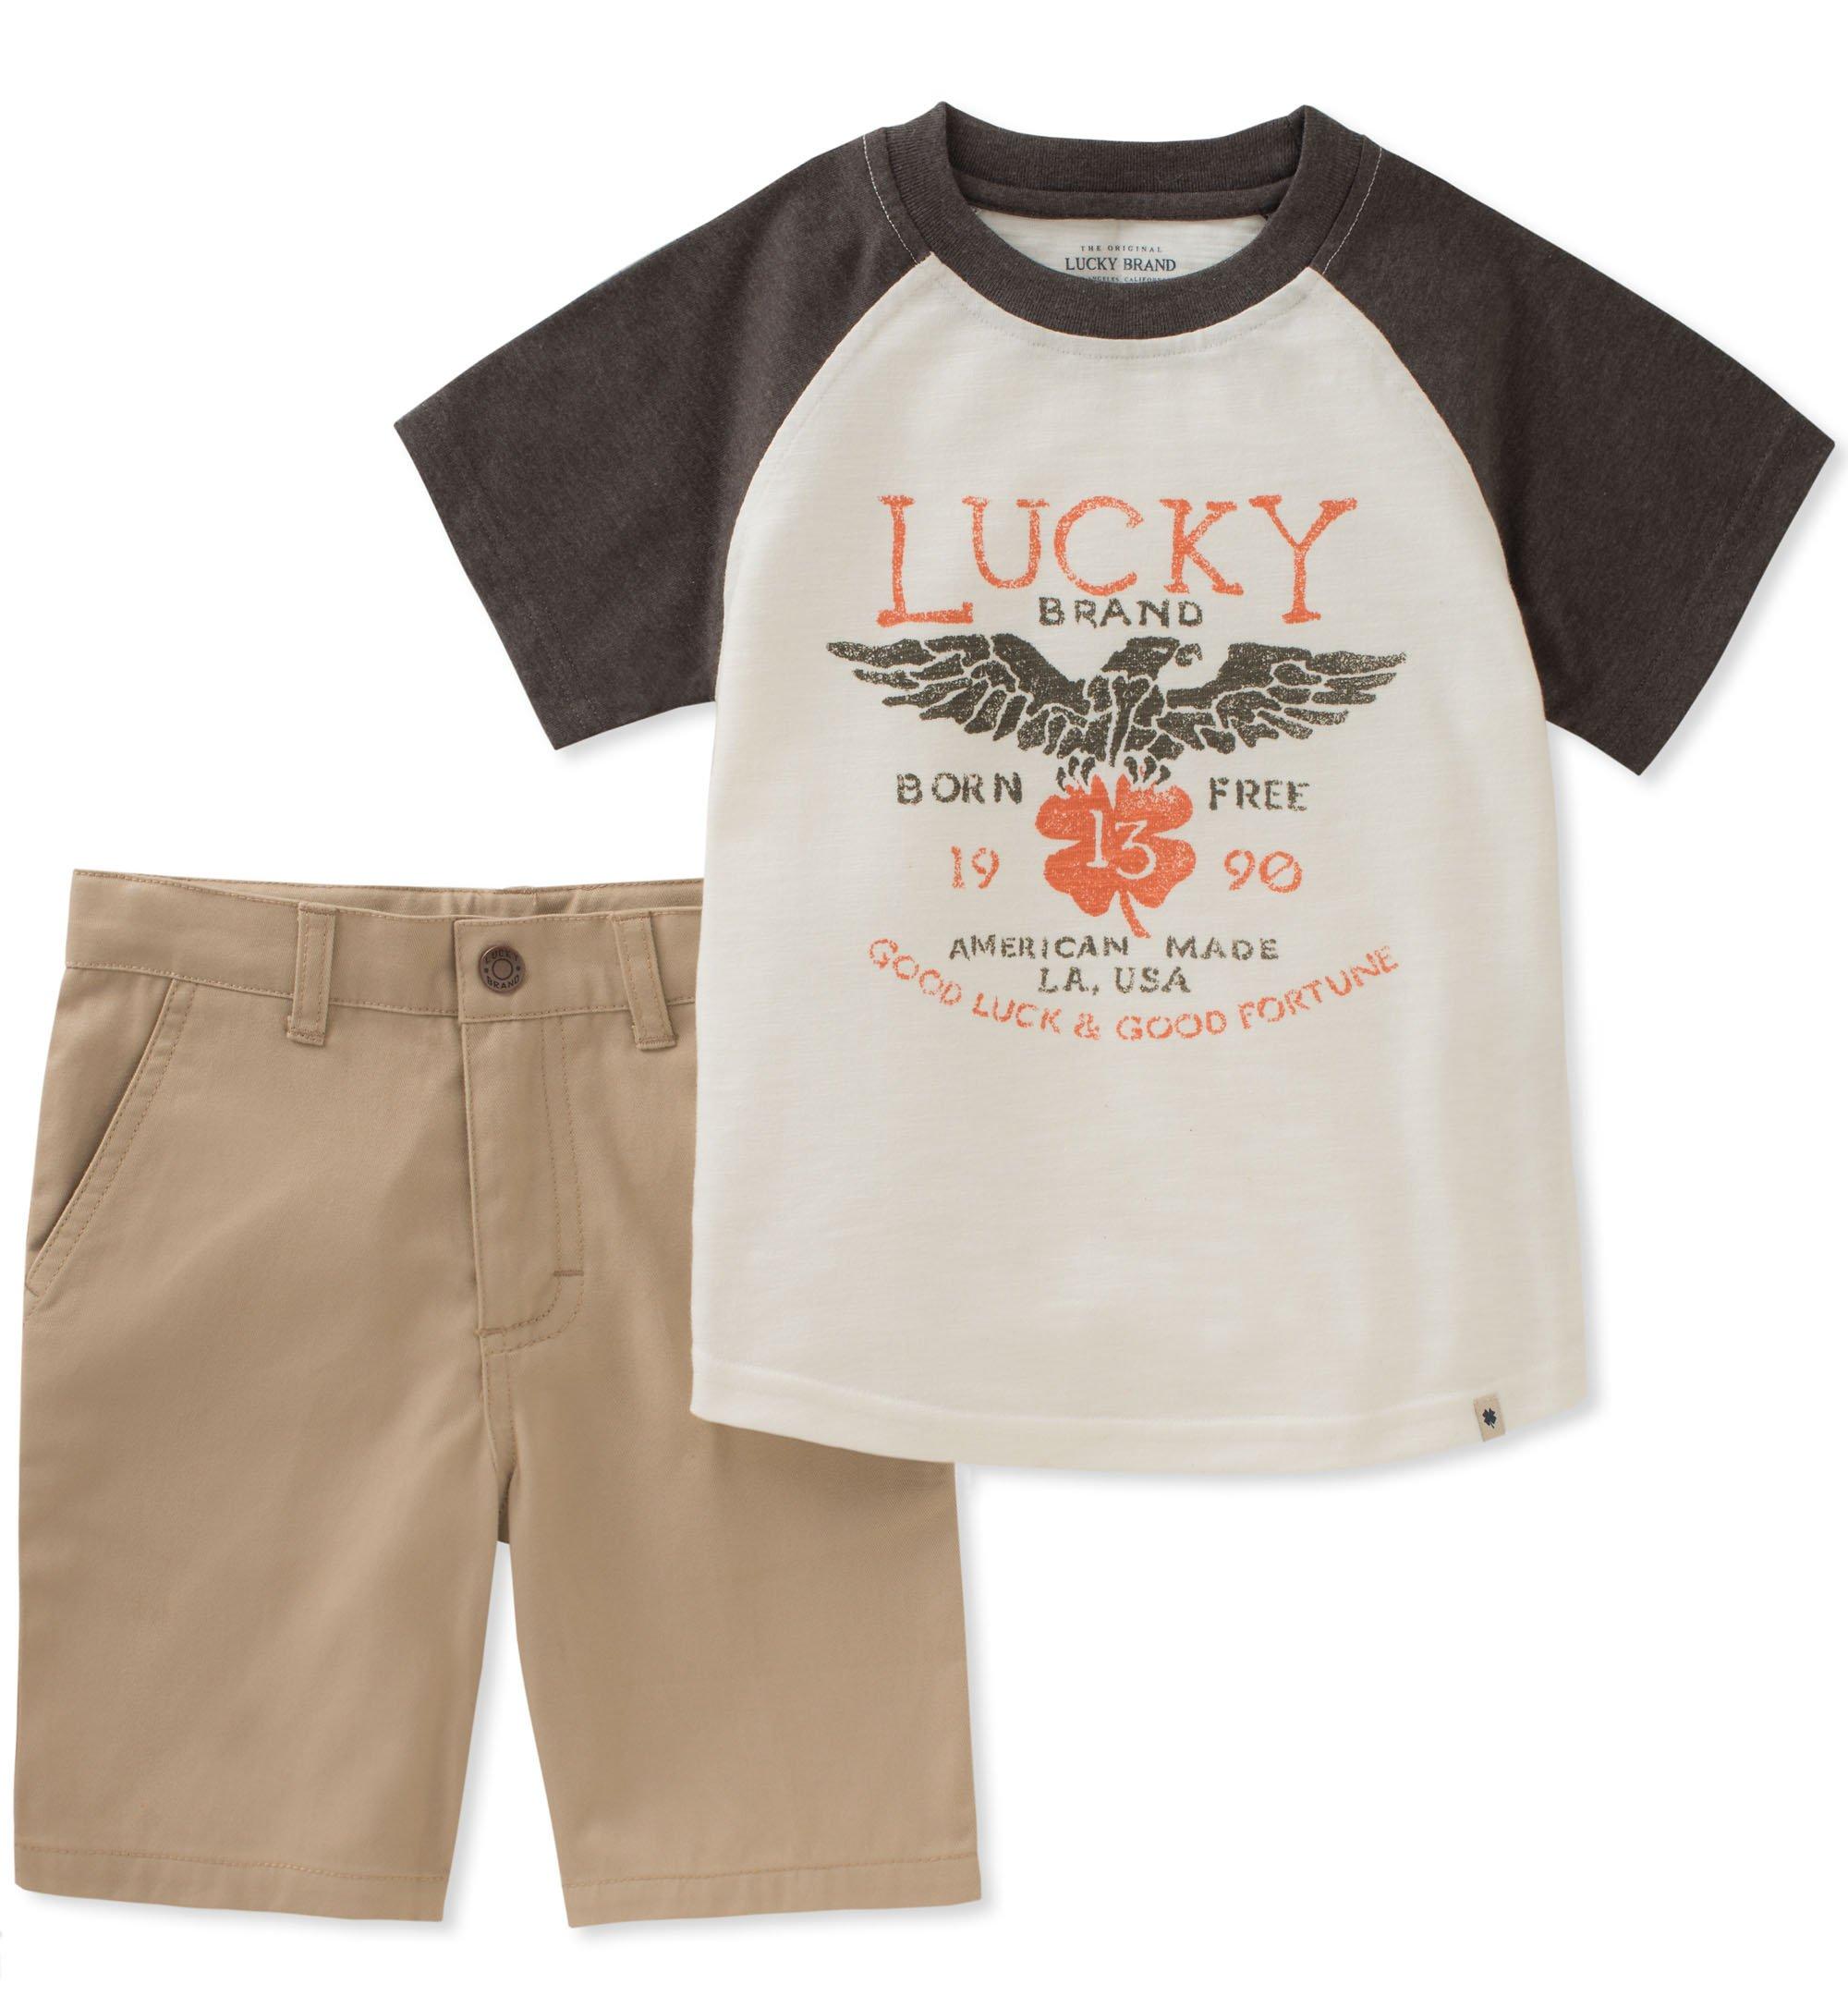 Lucky Brand Boys' Toddler 3/4 Sleeves Shorts Set, Cream, 4T